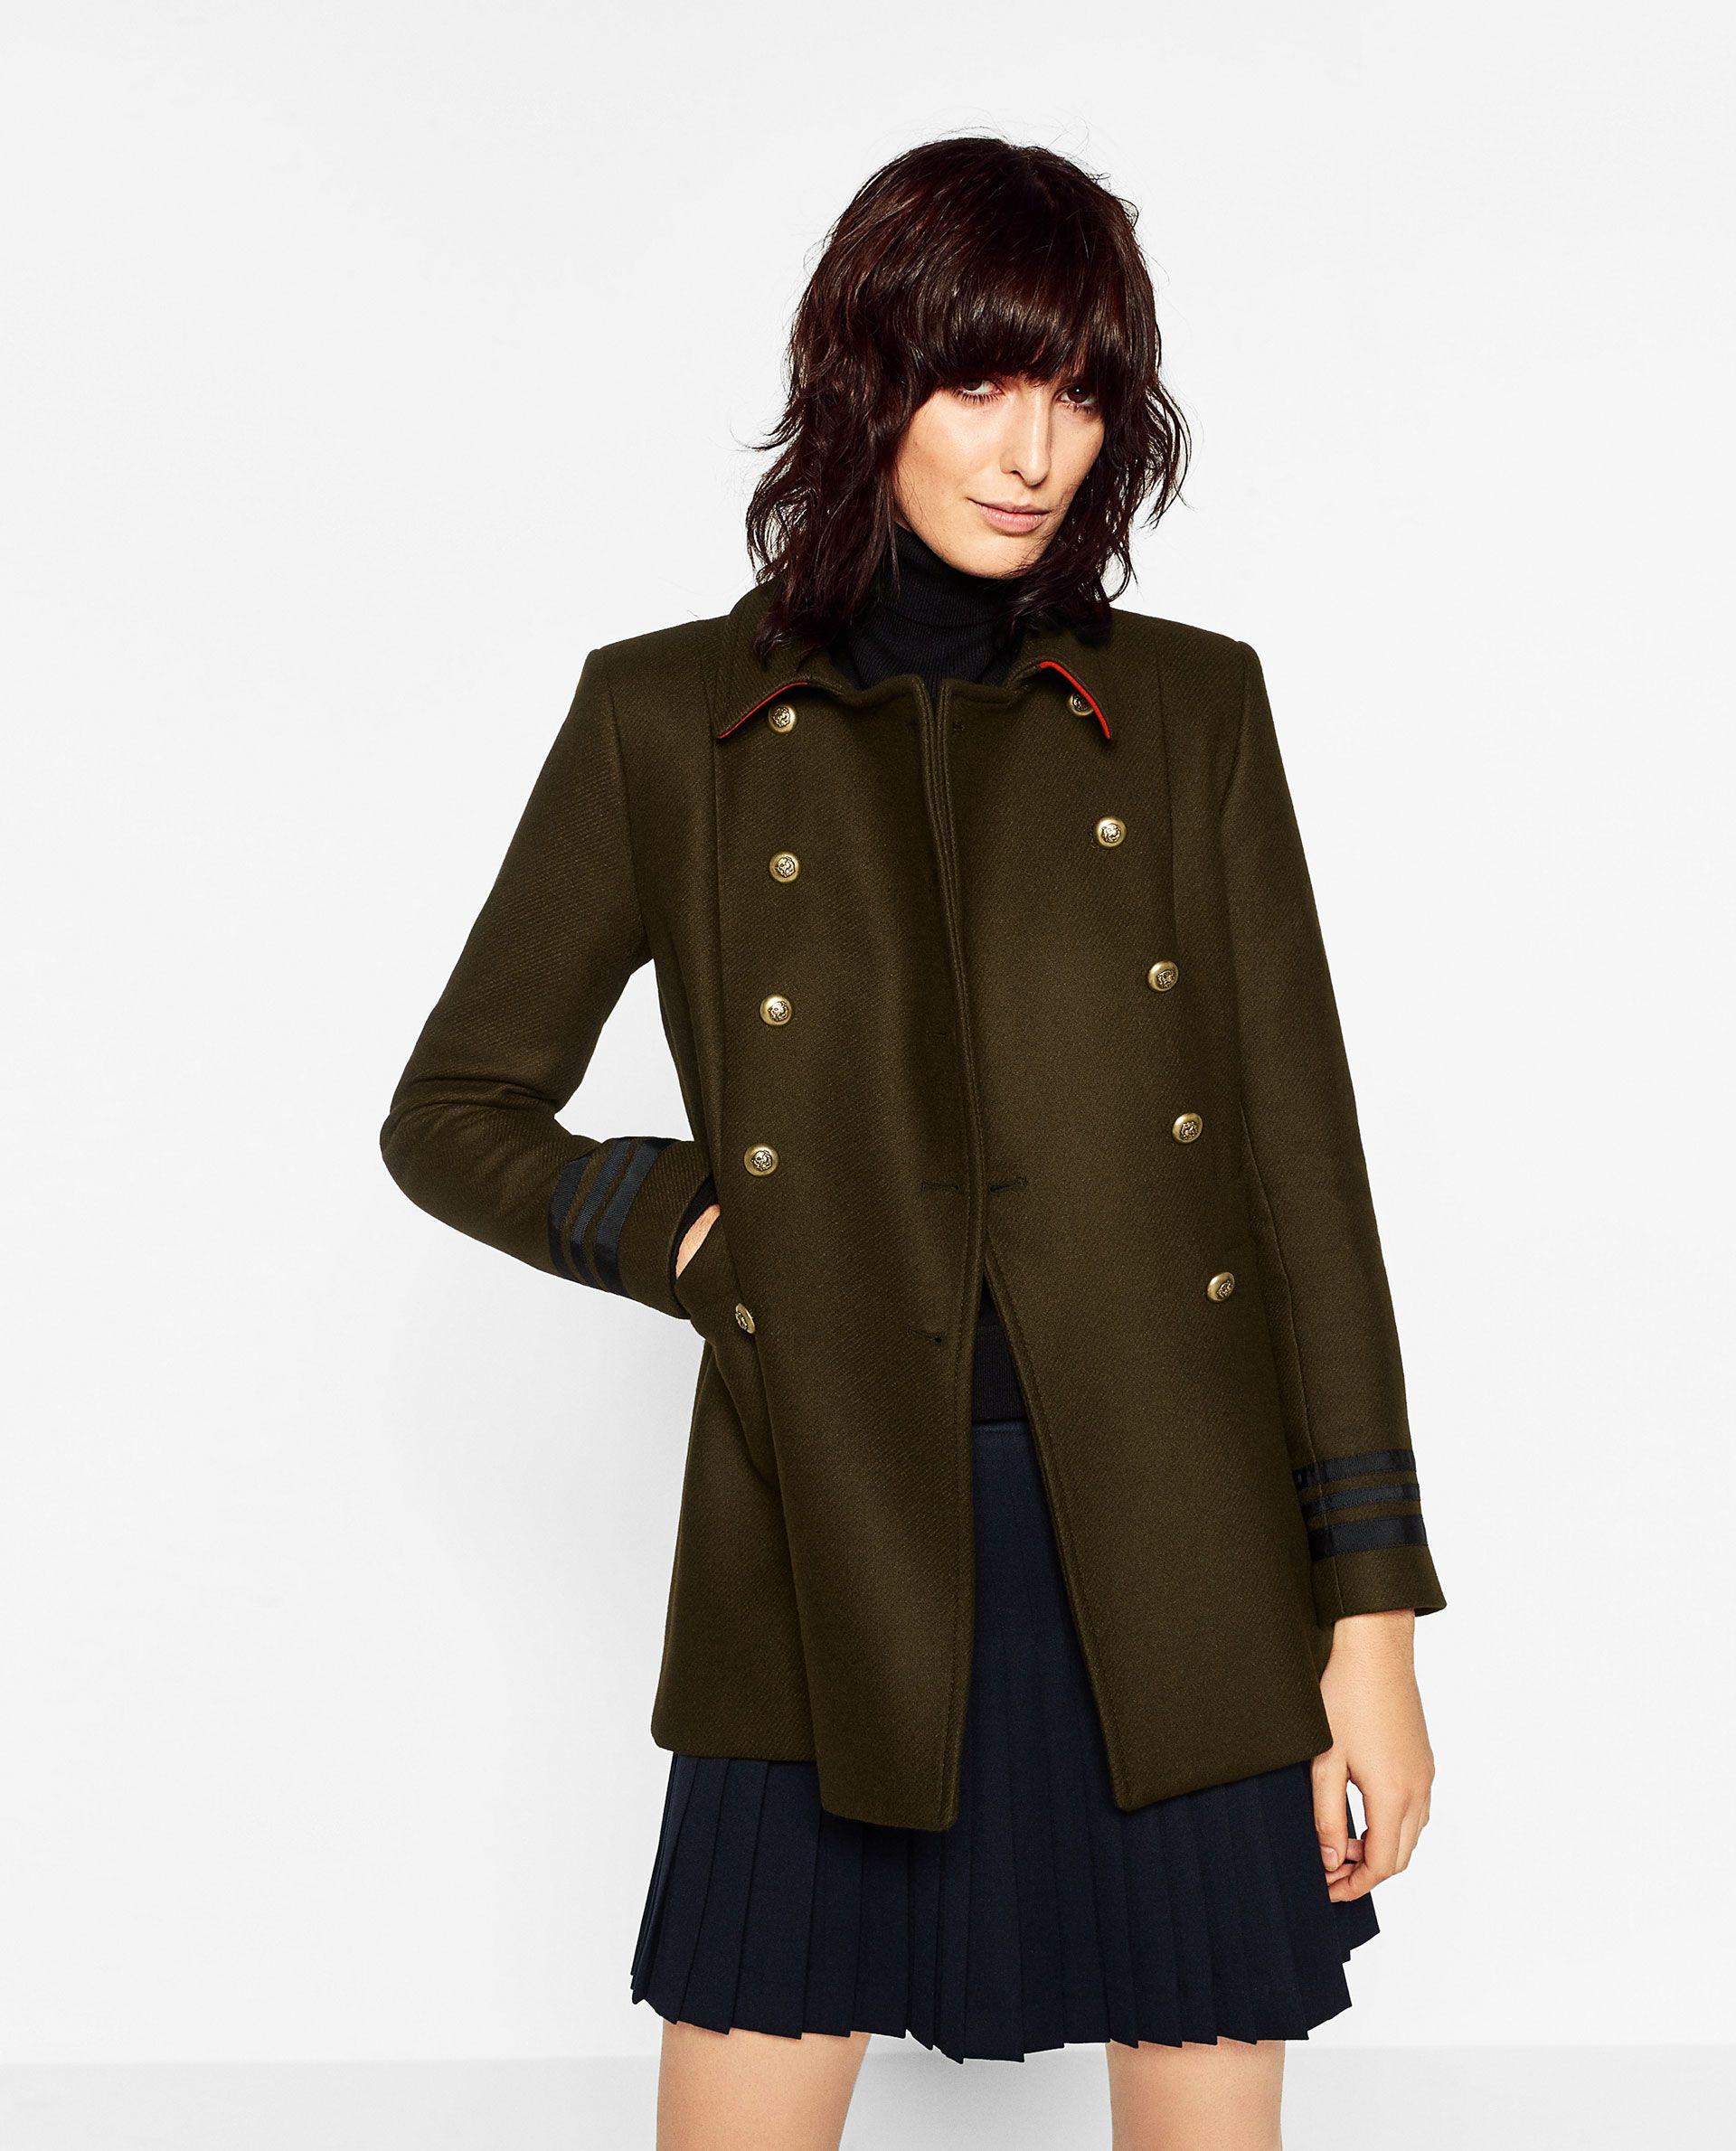 Femme Zara Mode Abrigos Pinterest 2018 Manteau rrzq5vx